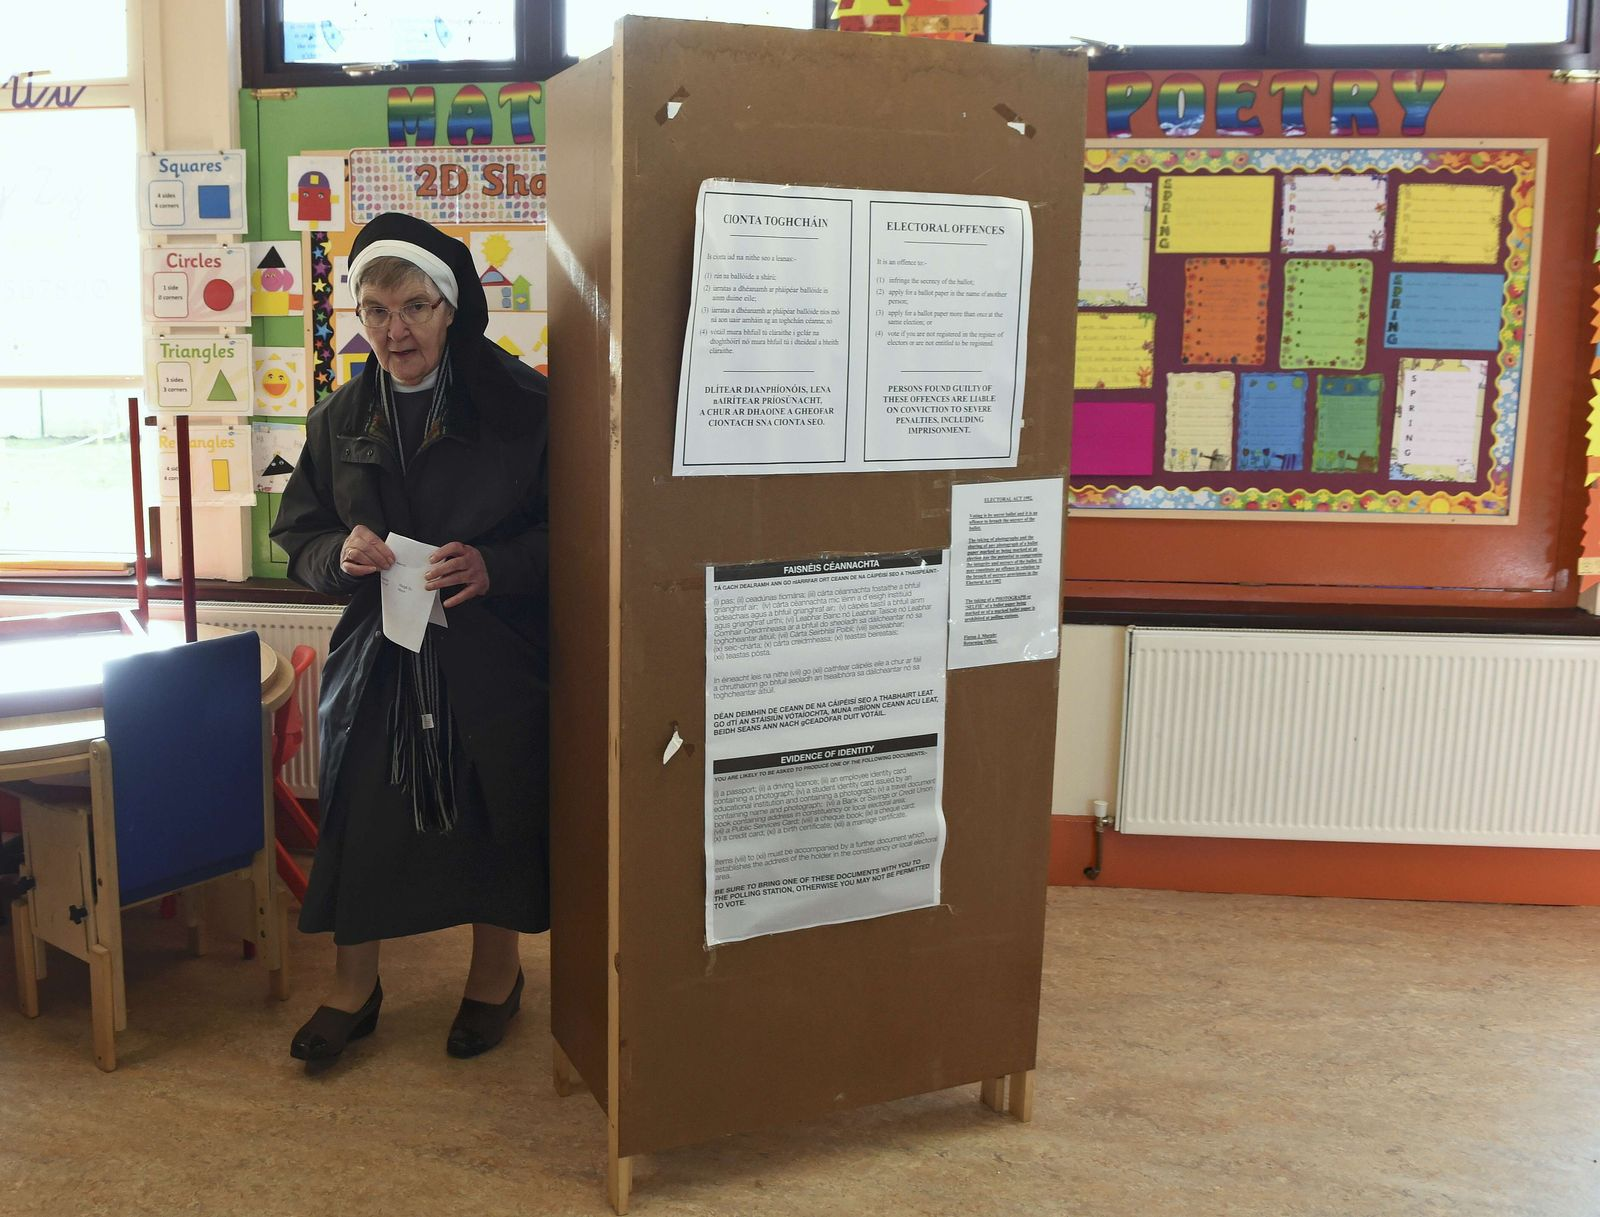 Irland Wahl